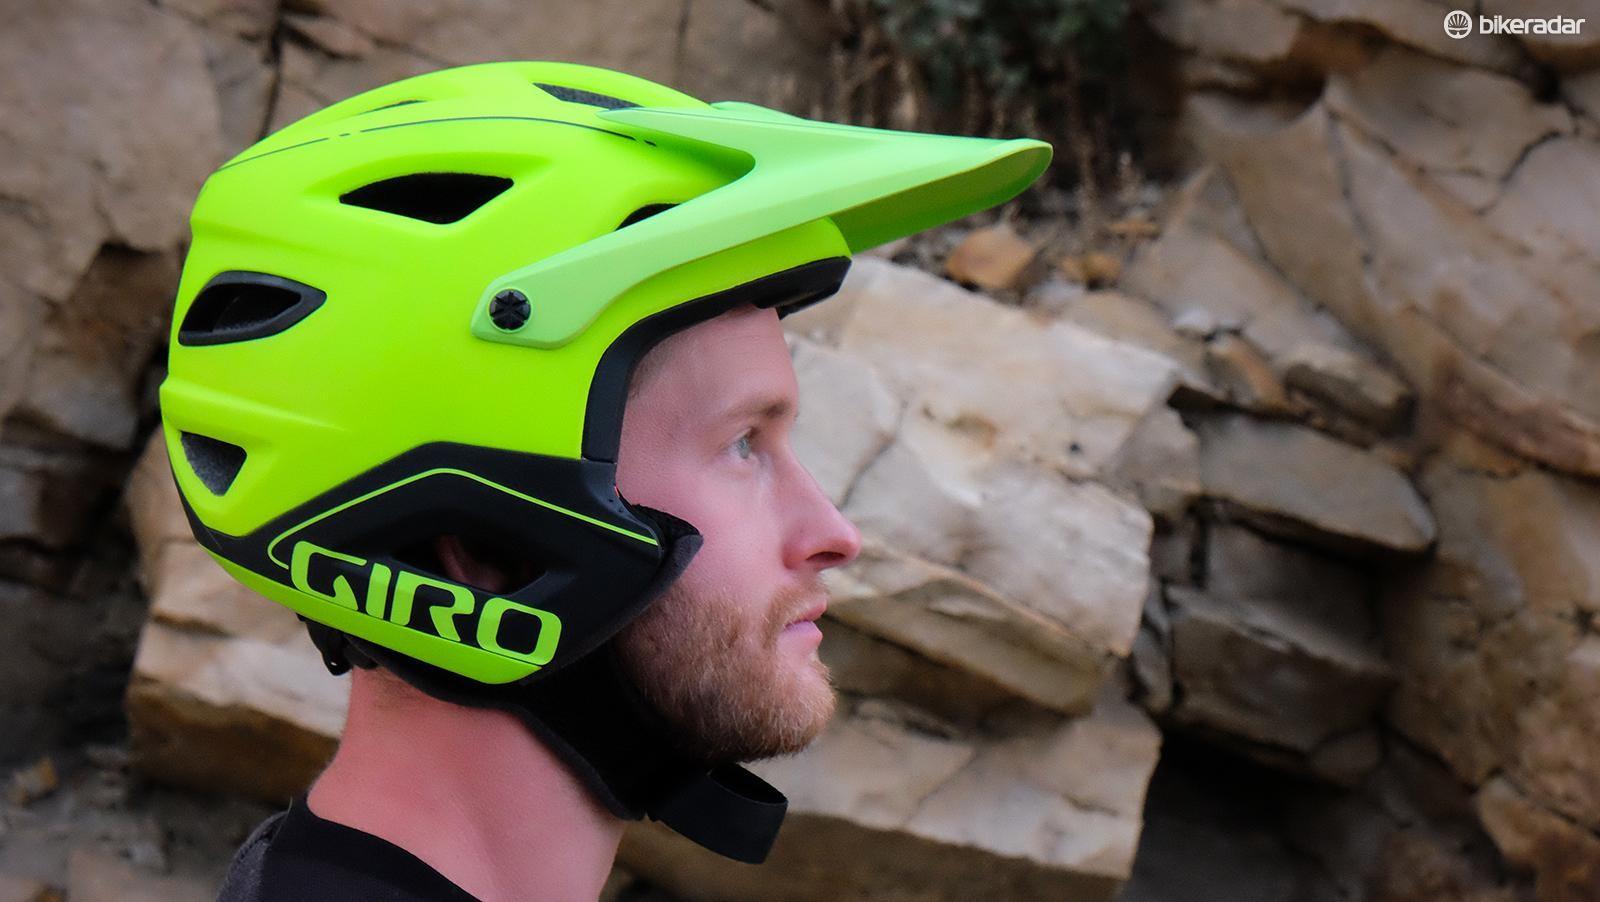 The Giro Switchblade in half-shell mode